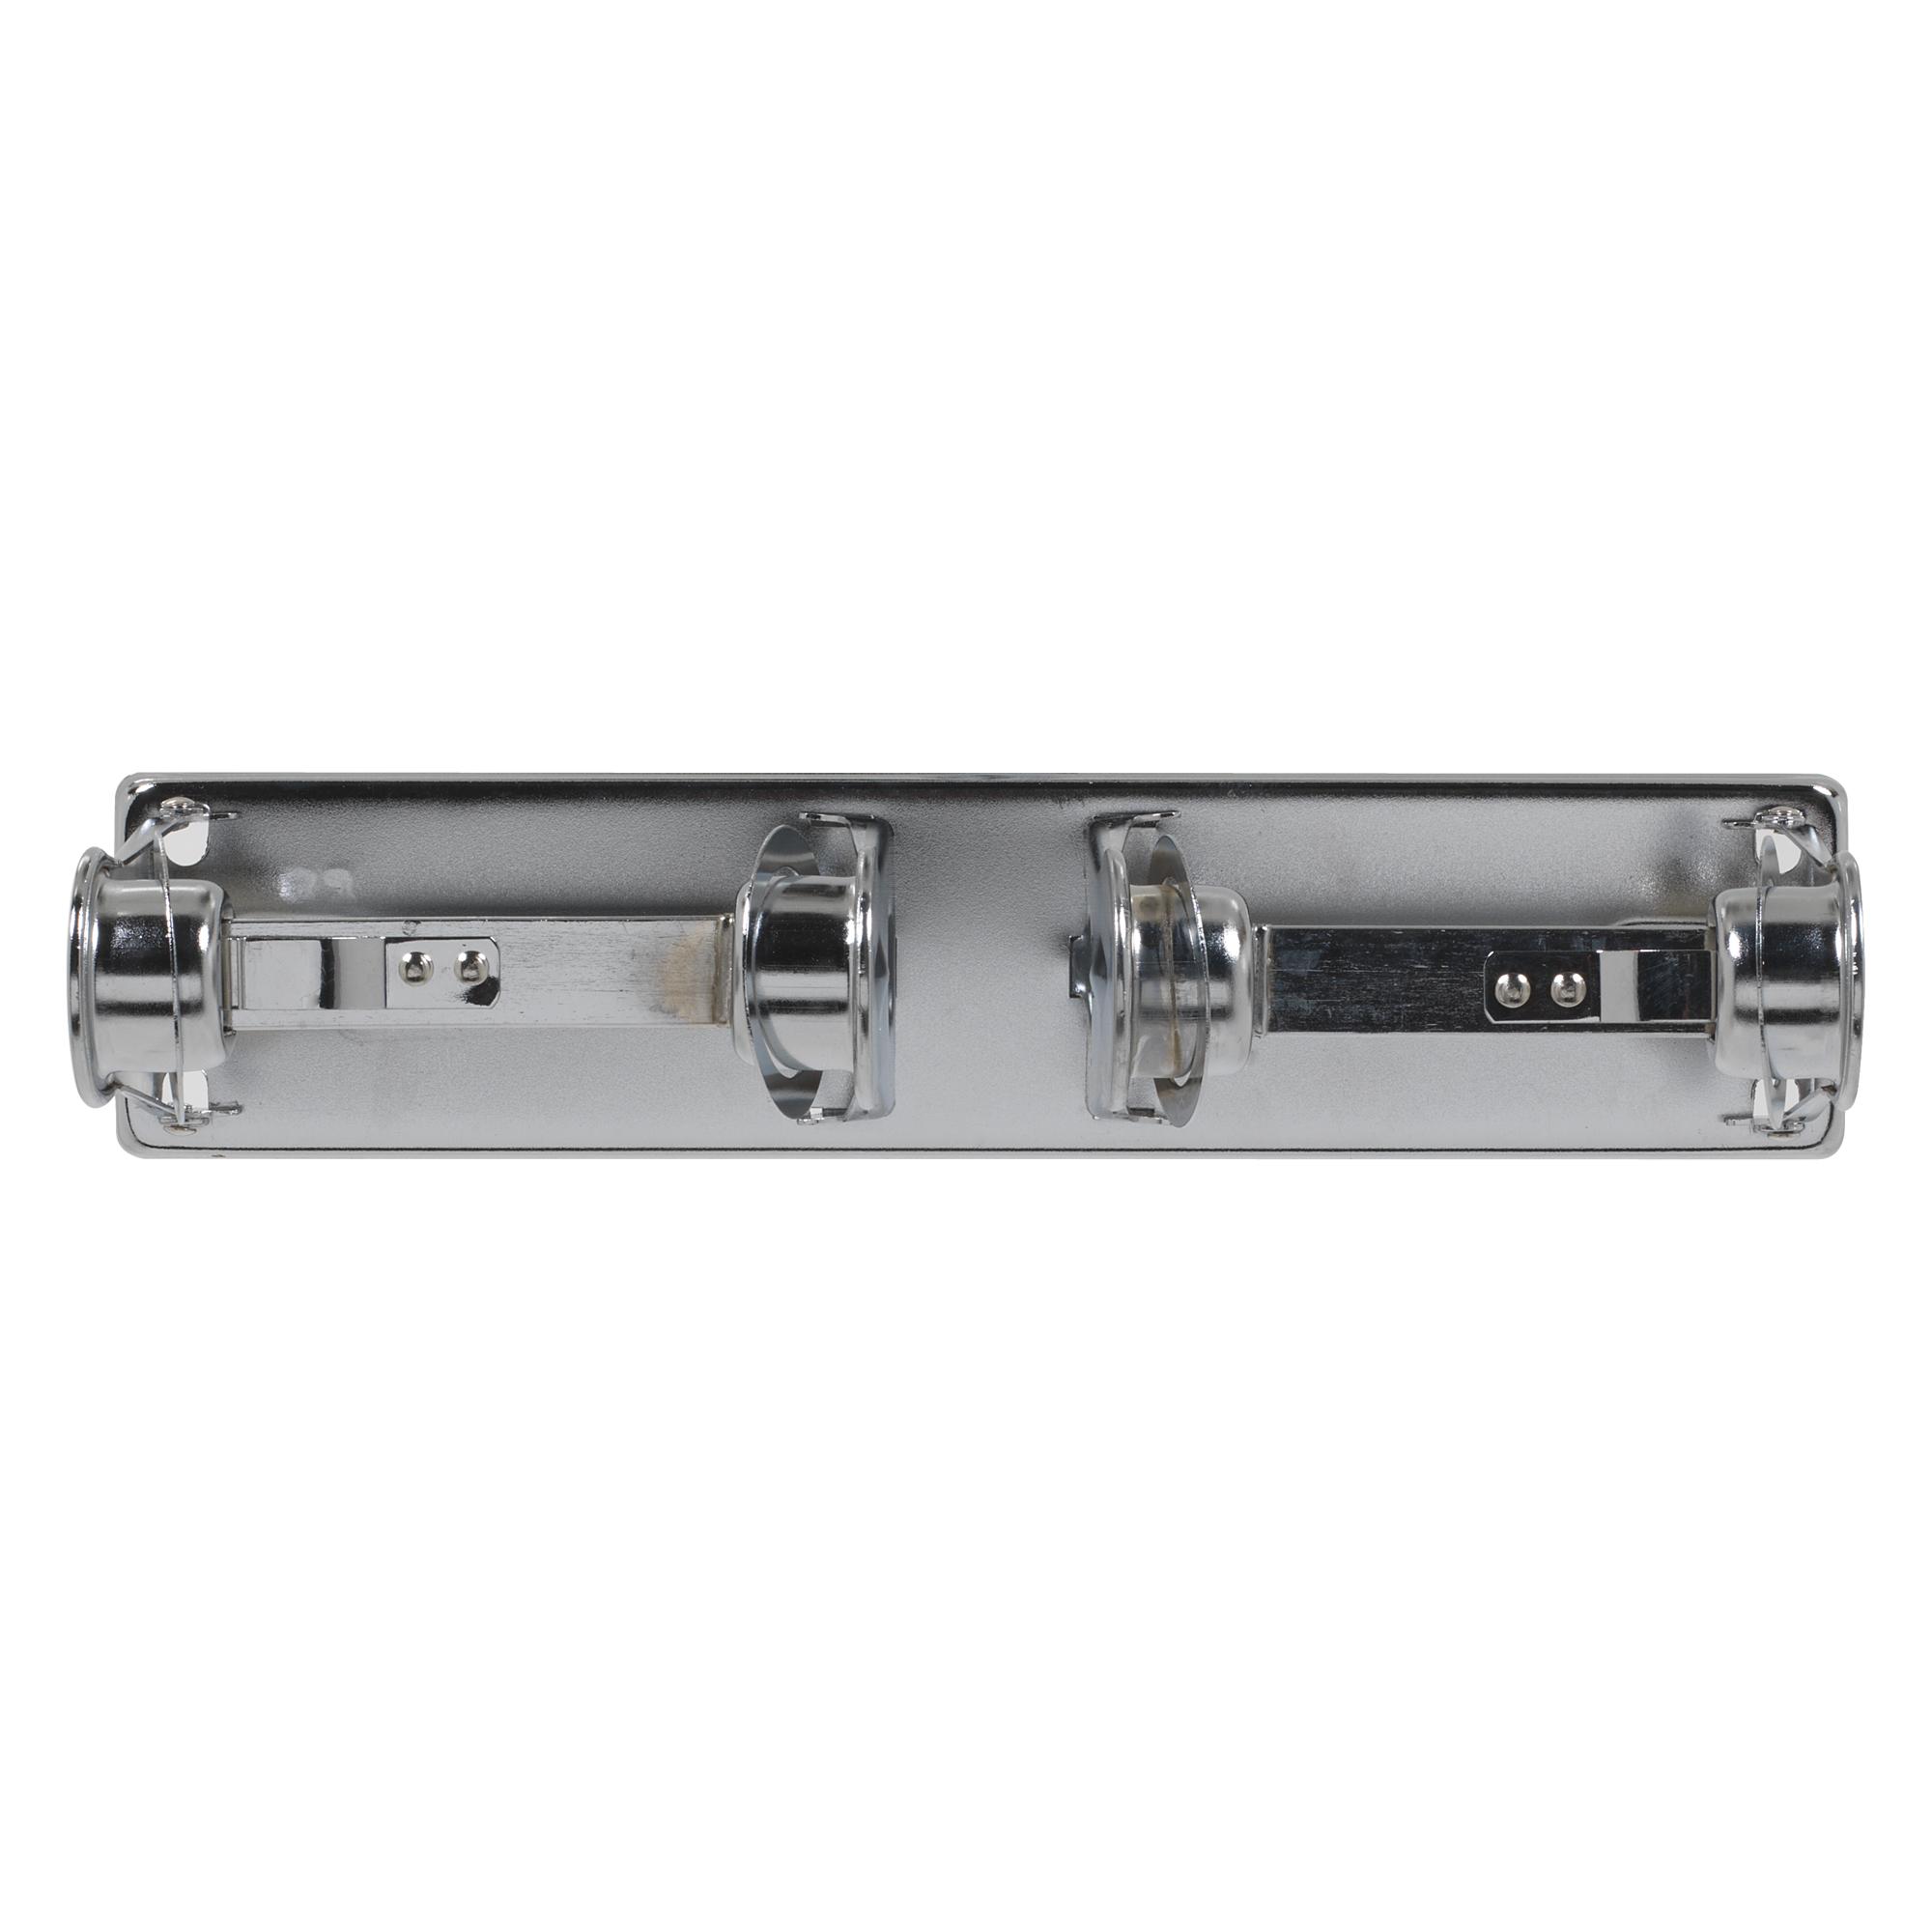 10073310571208 Georgia-Pacific® Chrome Metal 2-Roll Open Standard Bathroom Tissue Dispenser